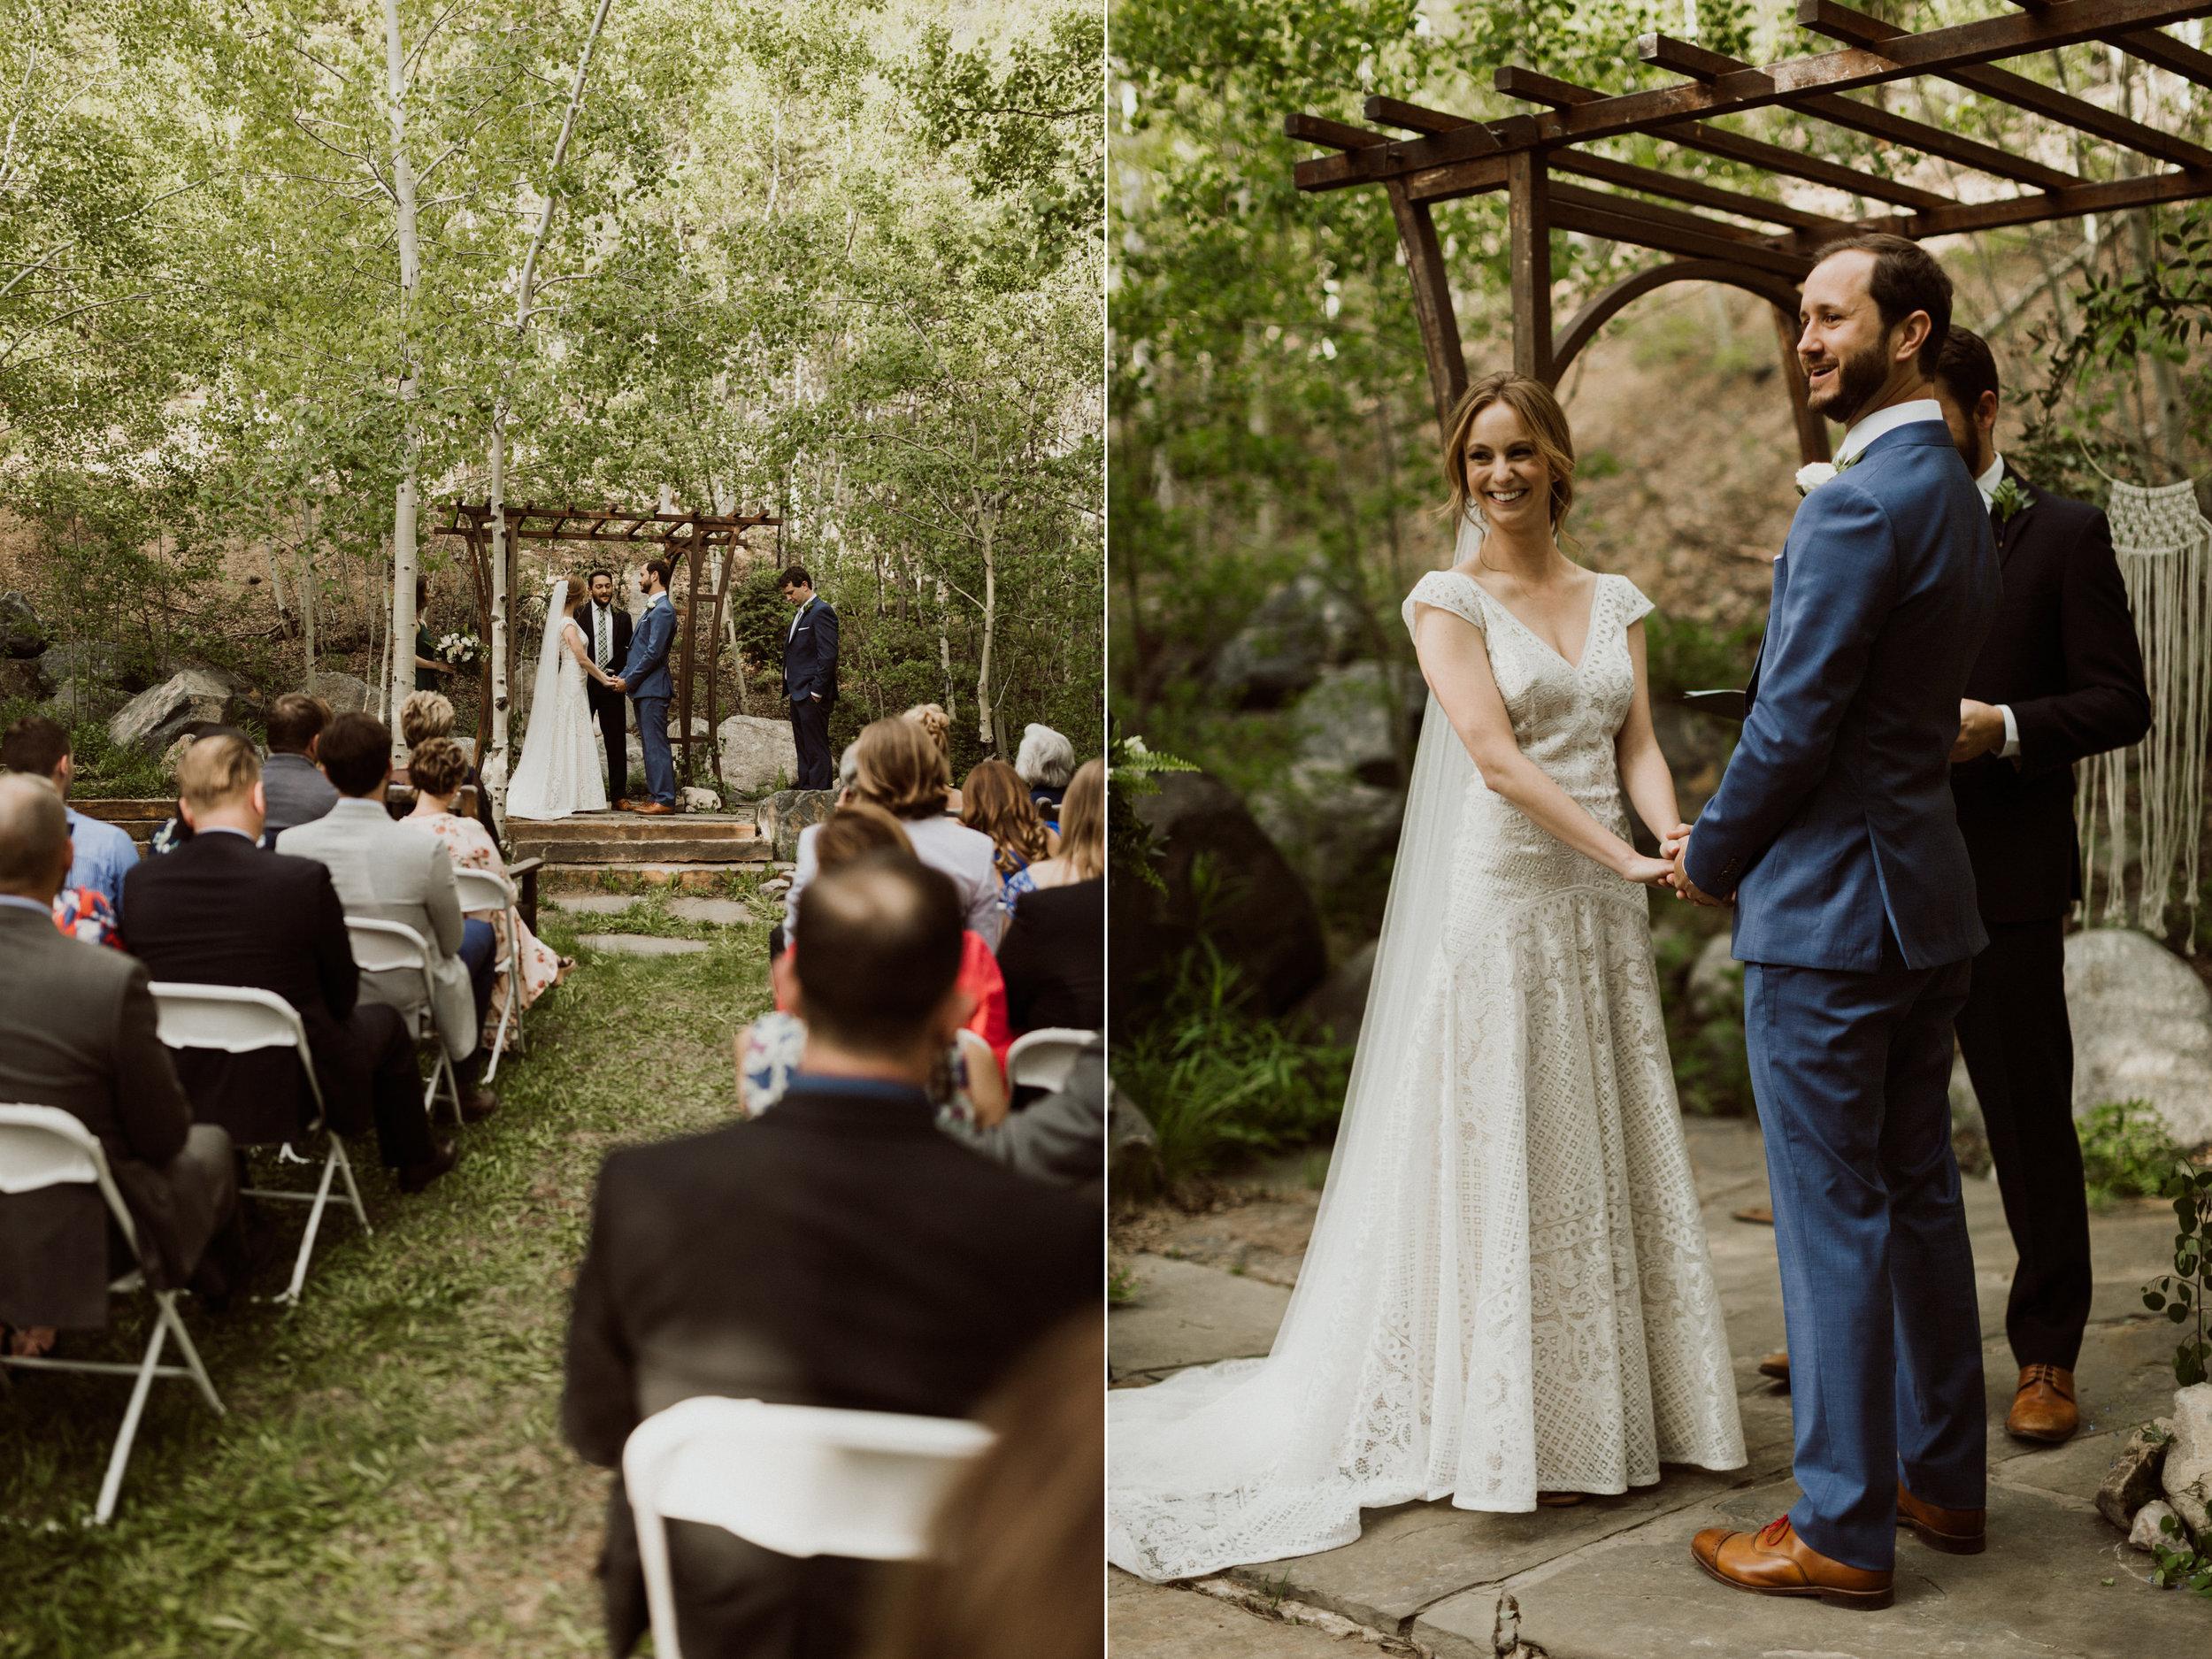 bohemian-backyard-wedding-breckenridge-colorado-169.jpg